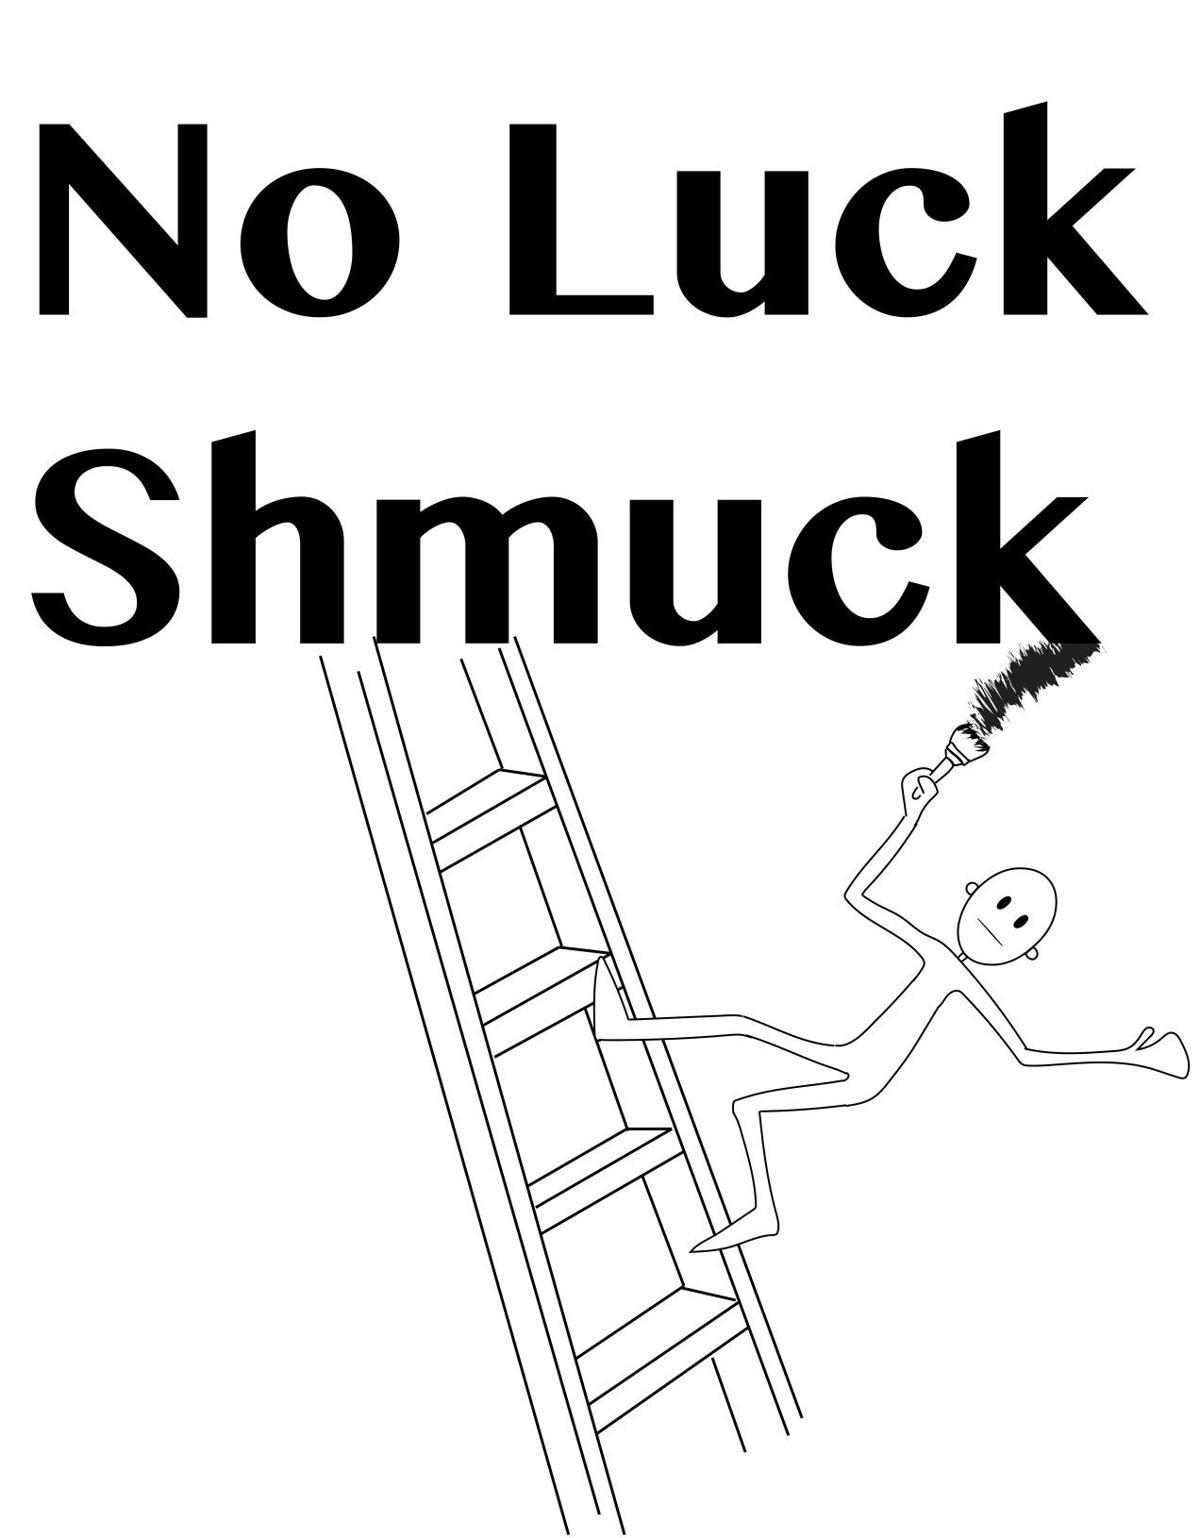 """No Luck Shmuck"" opens April 19"